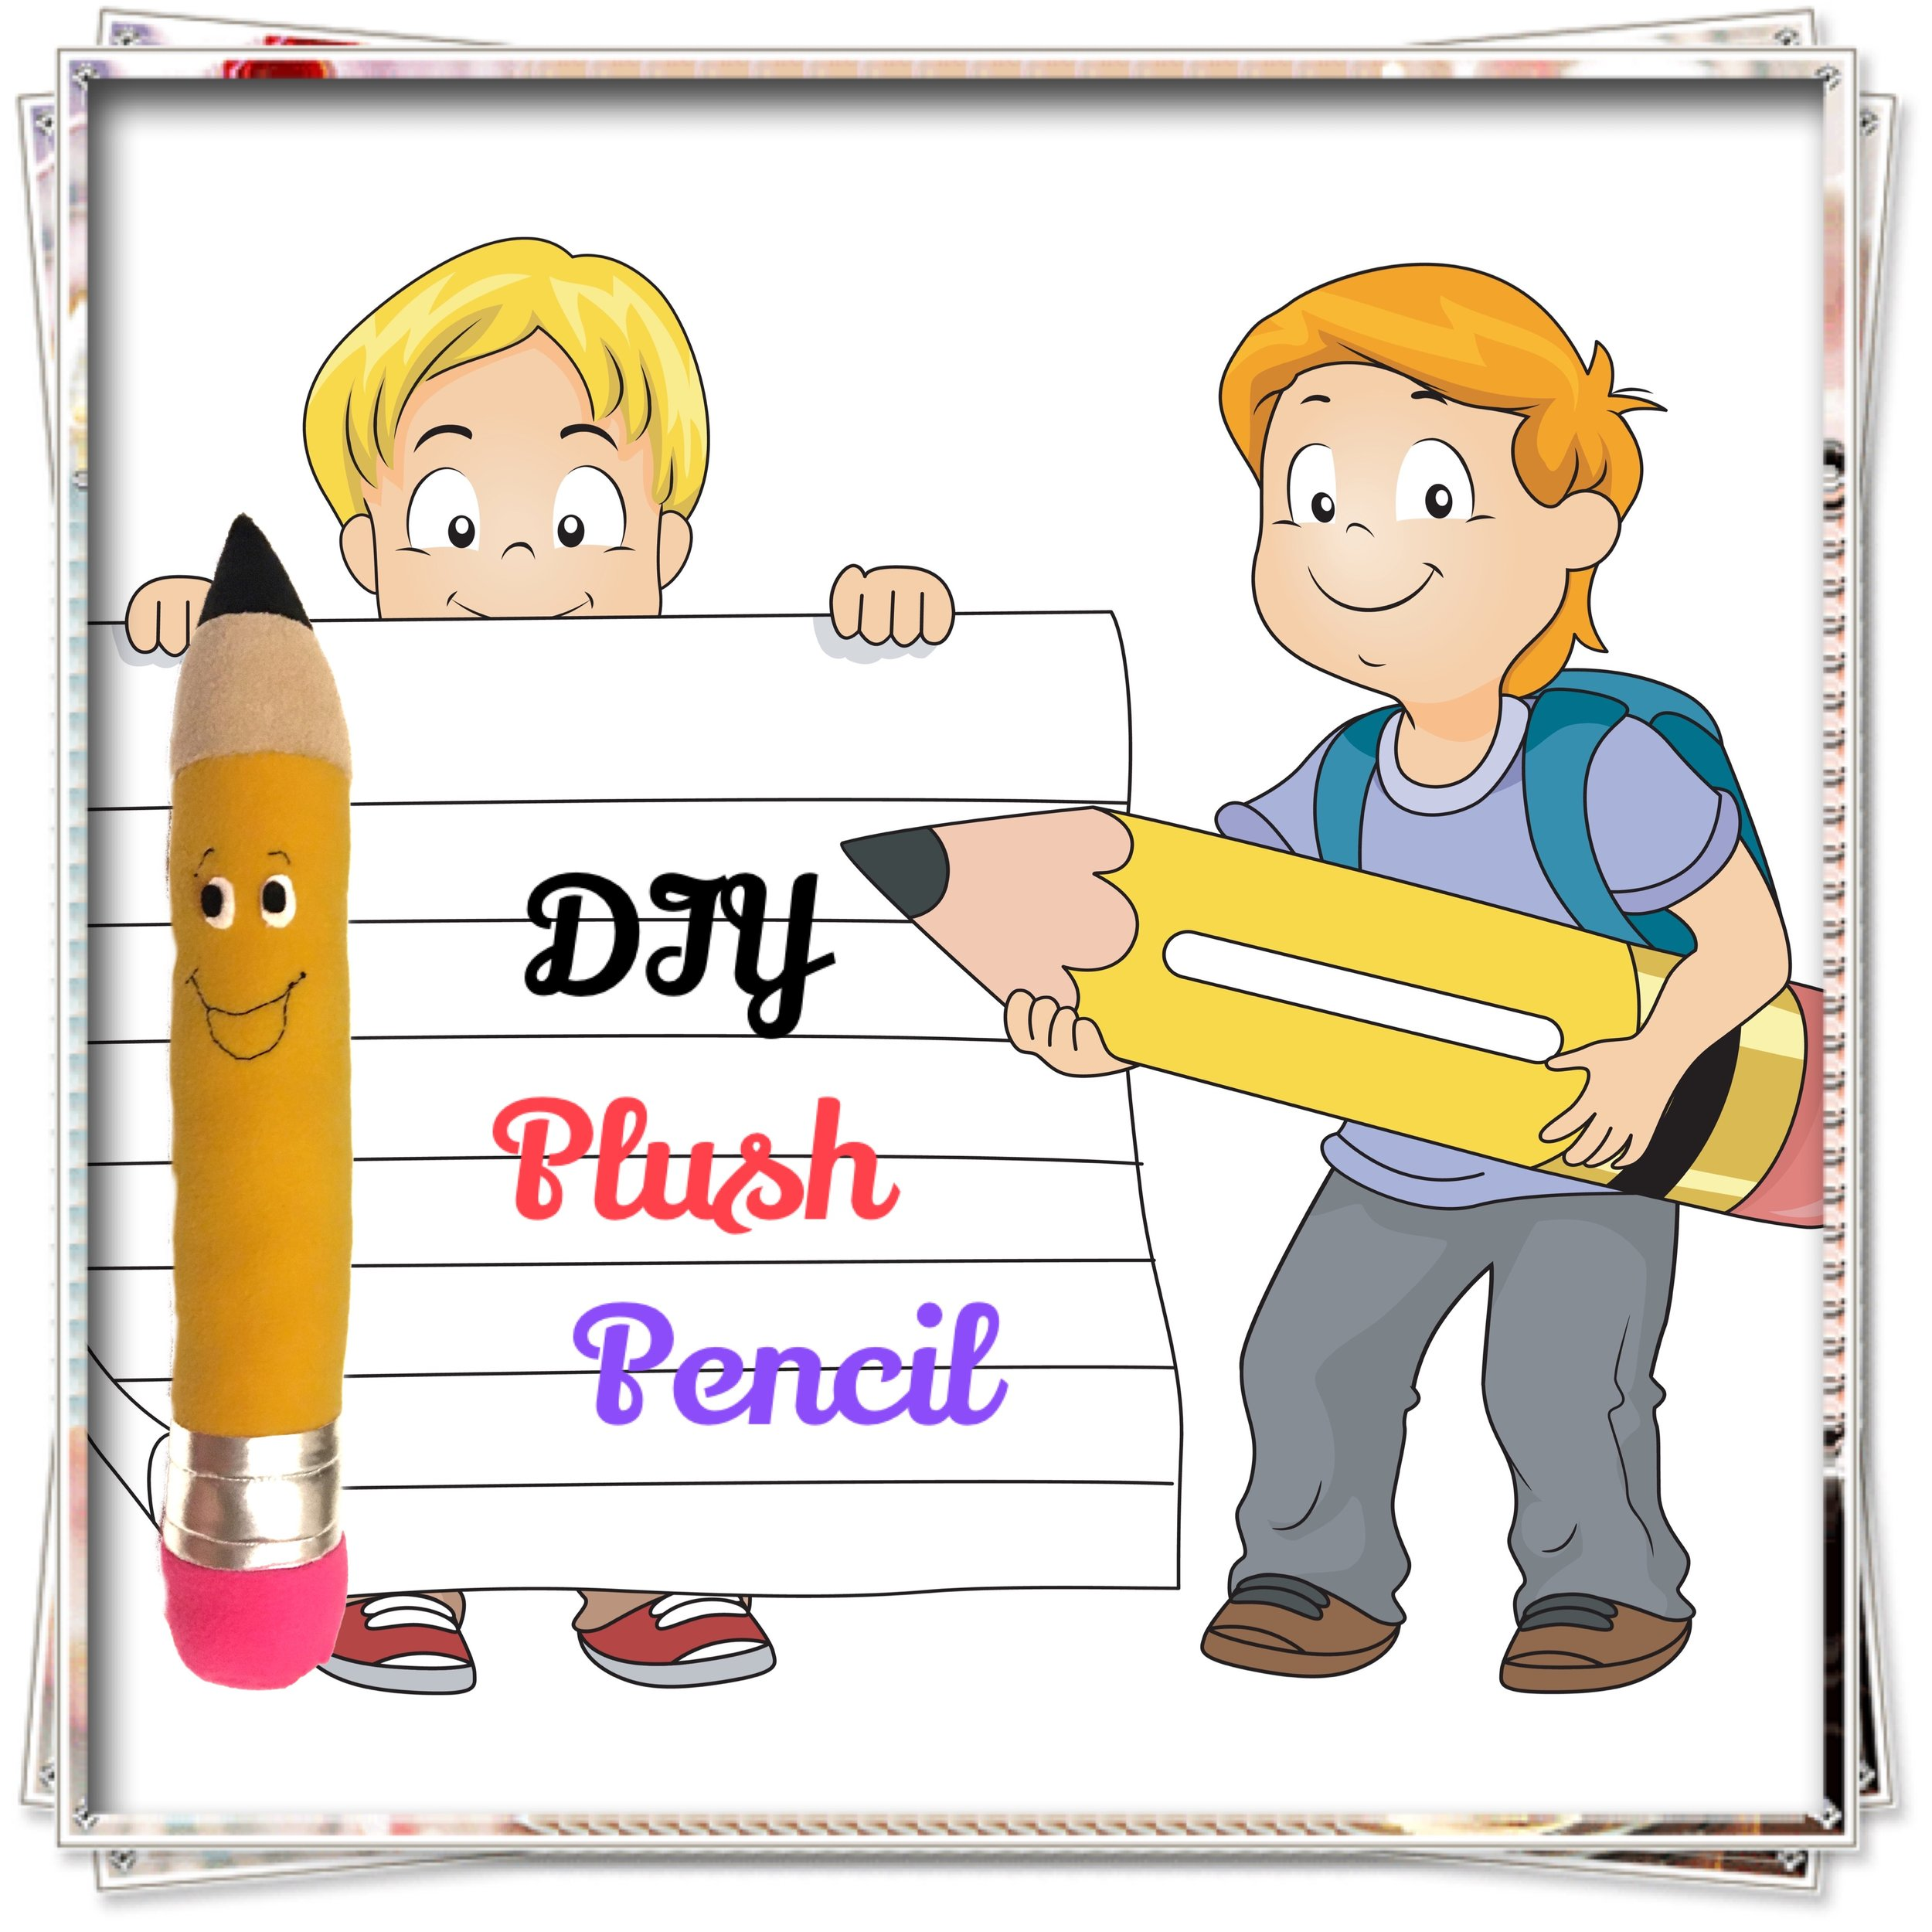 DIY Plush Pencil - Cute kids room decor!